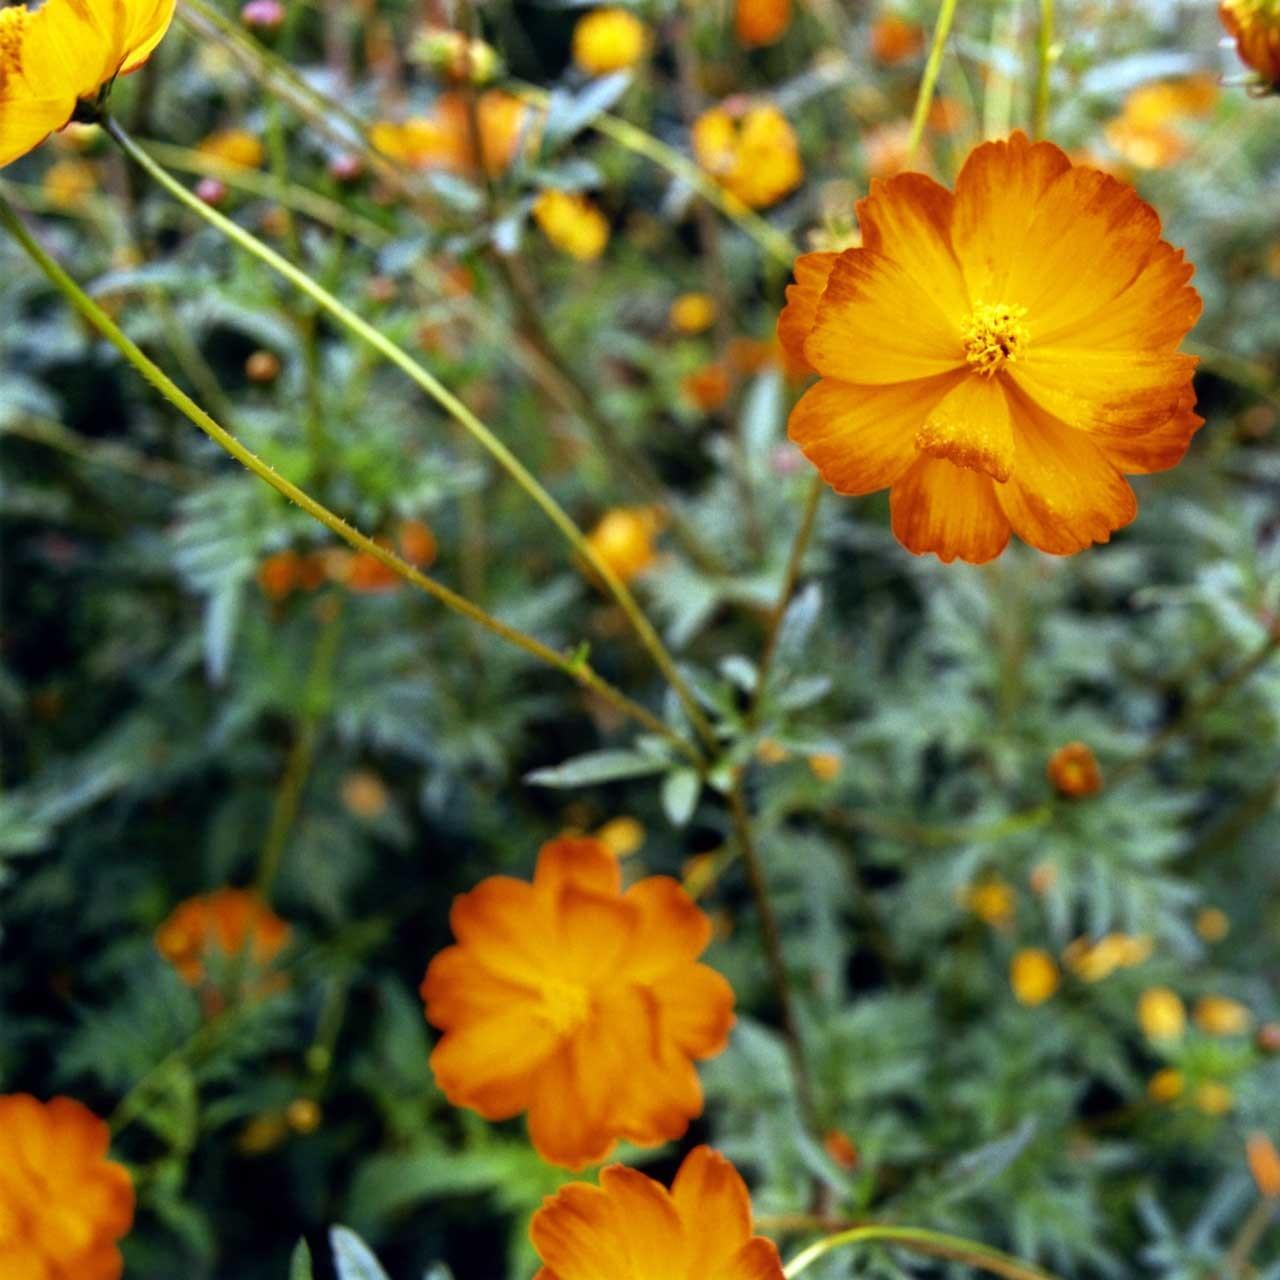 Laure-Maud_photographe_jardin-fleurs_cosmos-2